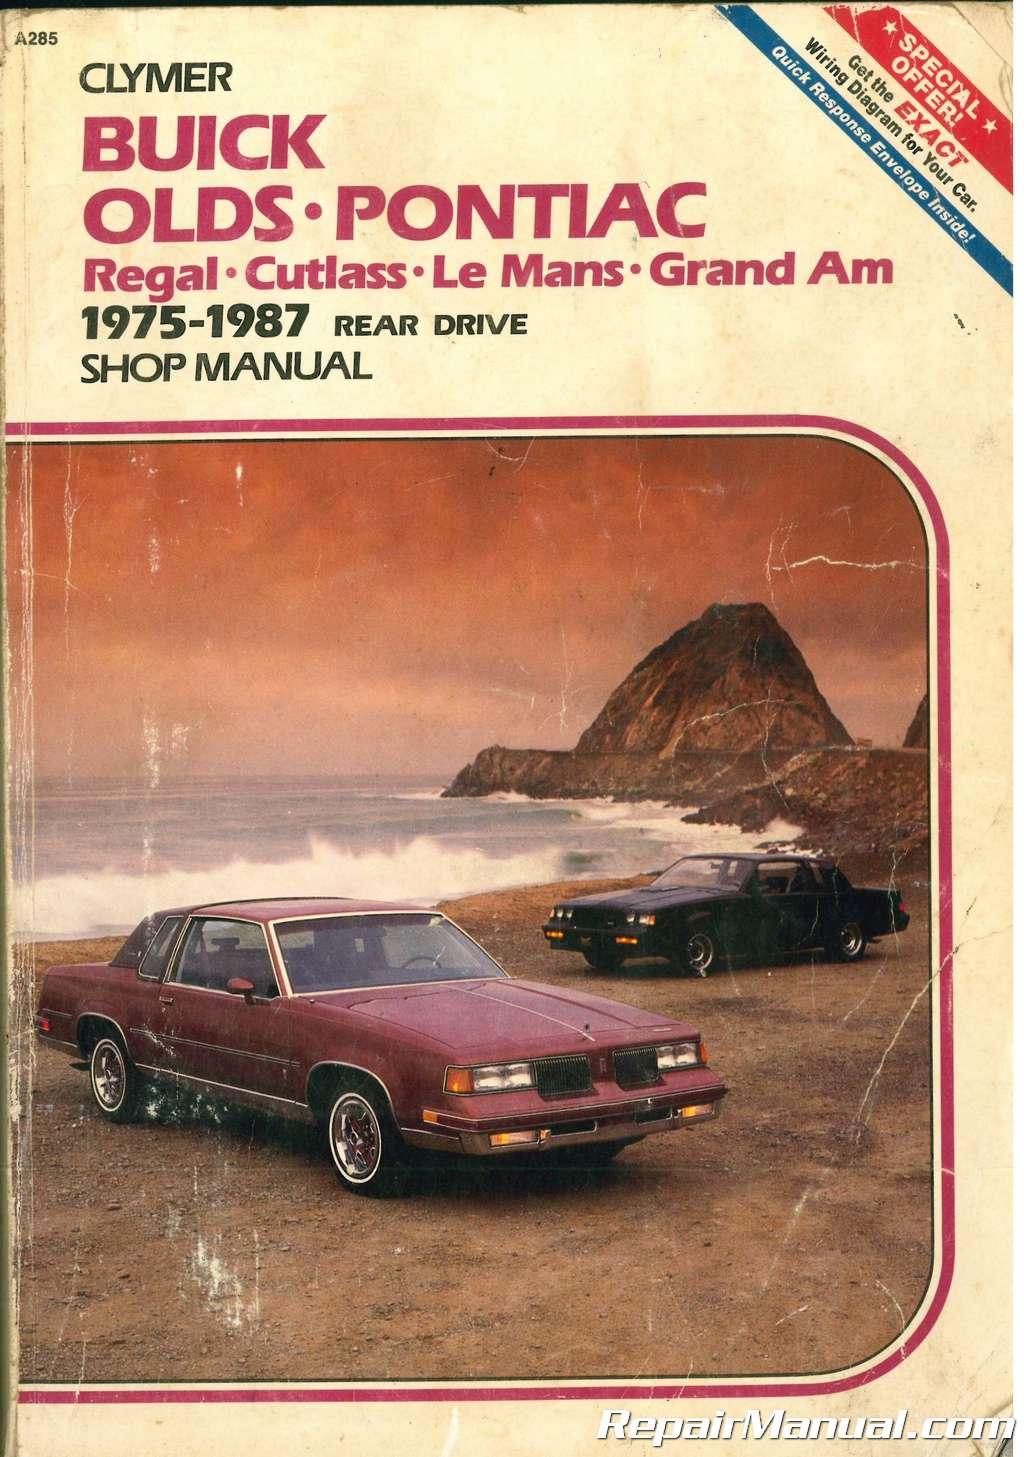 Clymer Buick Olds Pontiac Regal Cutlass Le Mans Grand Am 1975 1987 Prix Wiring Diagram Rear Drive Gas Diesel Shop Manual